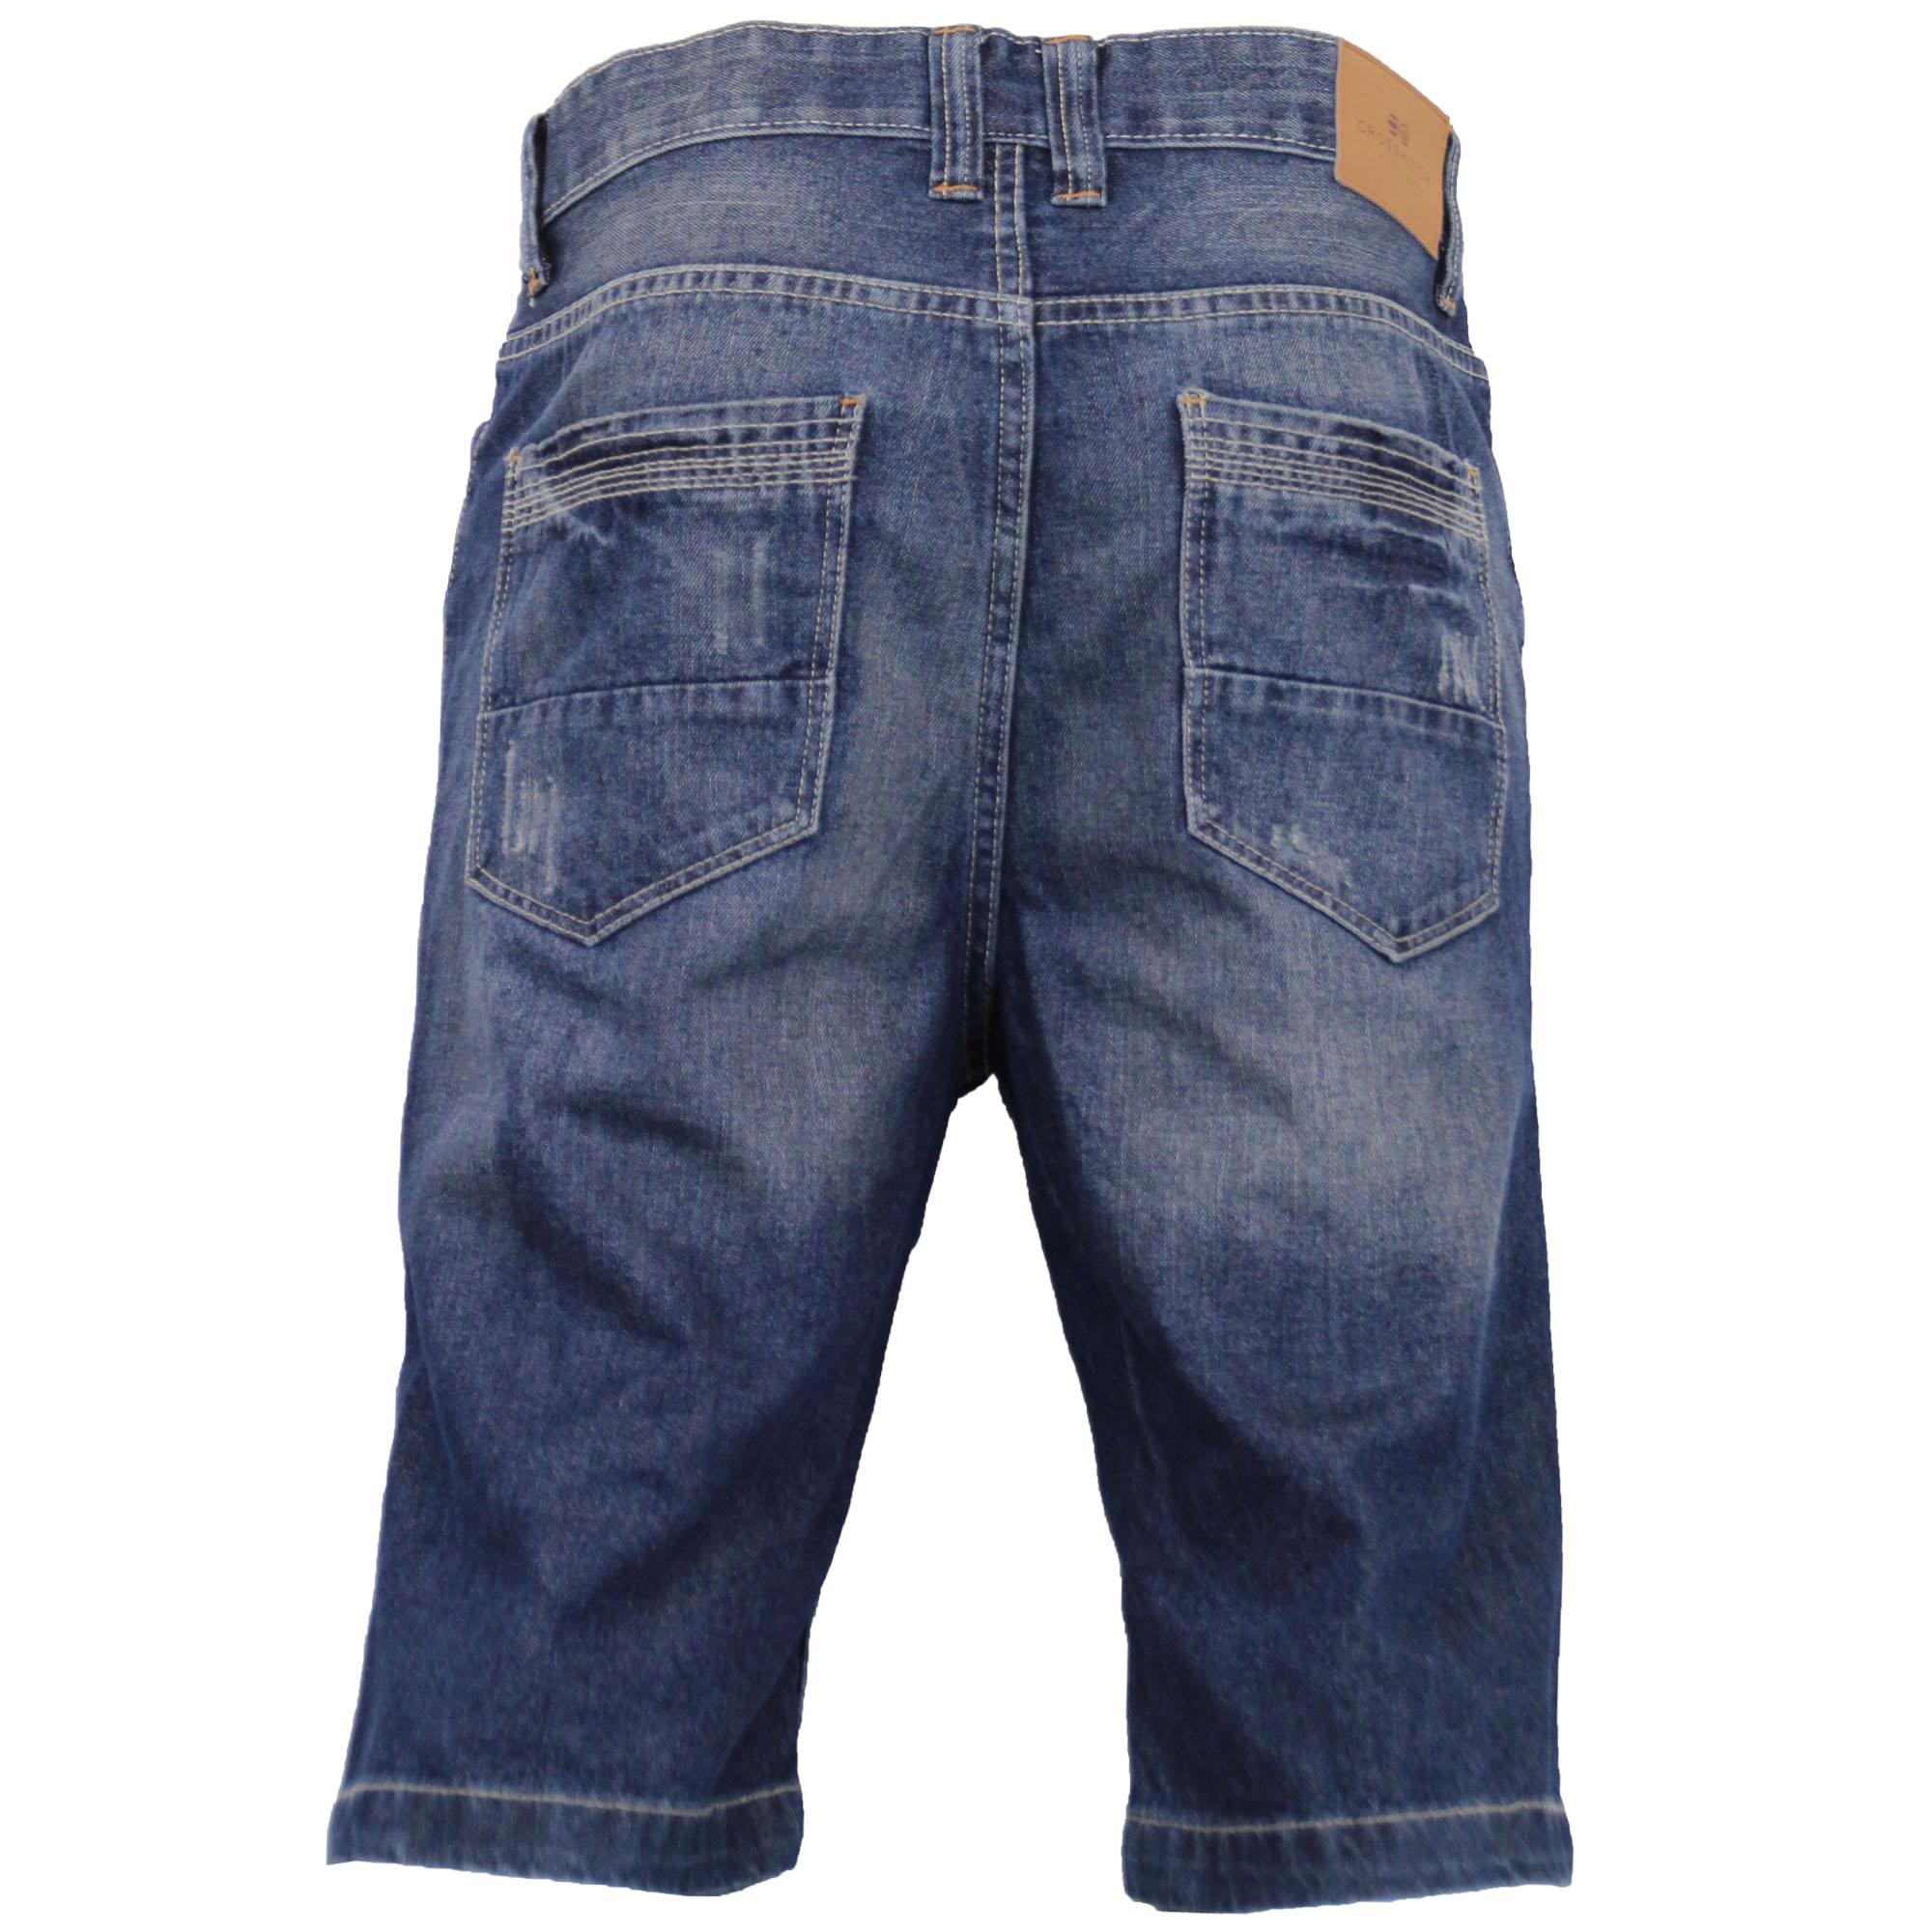 Mens-Crosshatch-Denim-Knee-Length-Combat-Shorts-Cargo-Casual-Fashion-Summer-New 縮圖 18